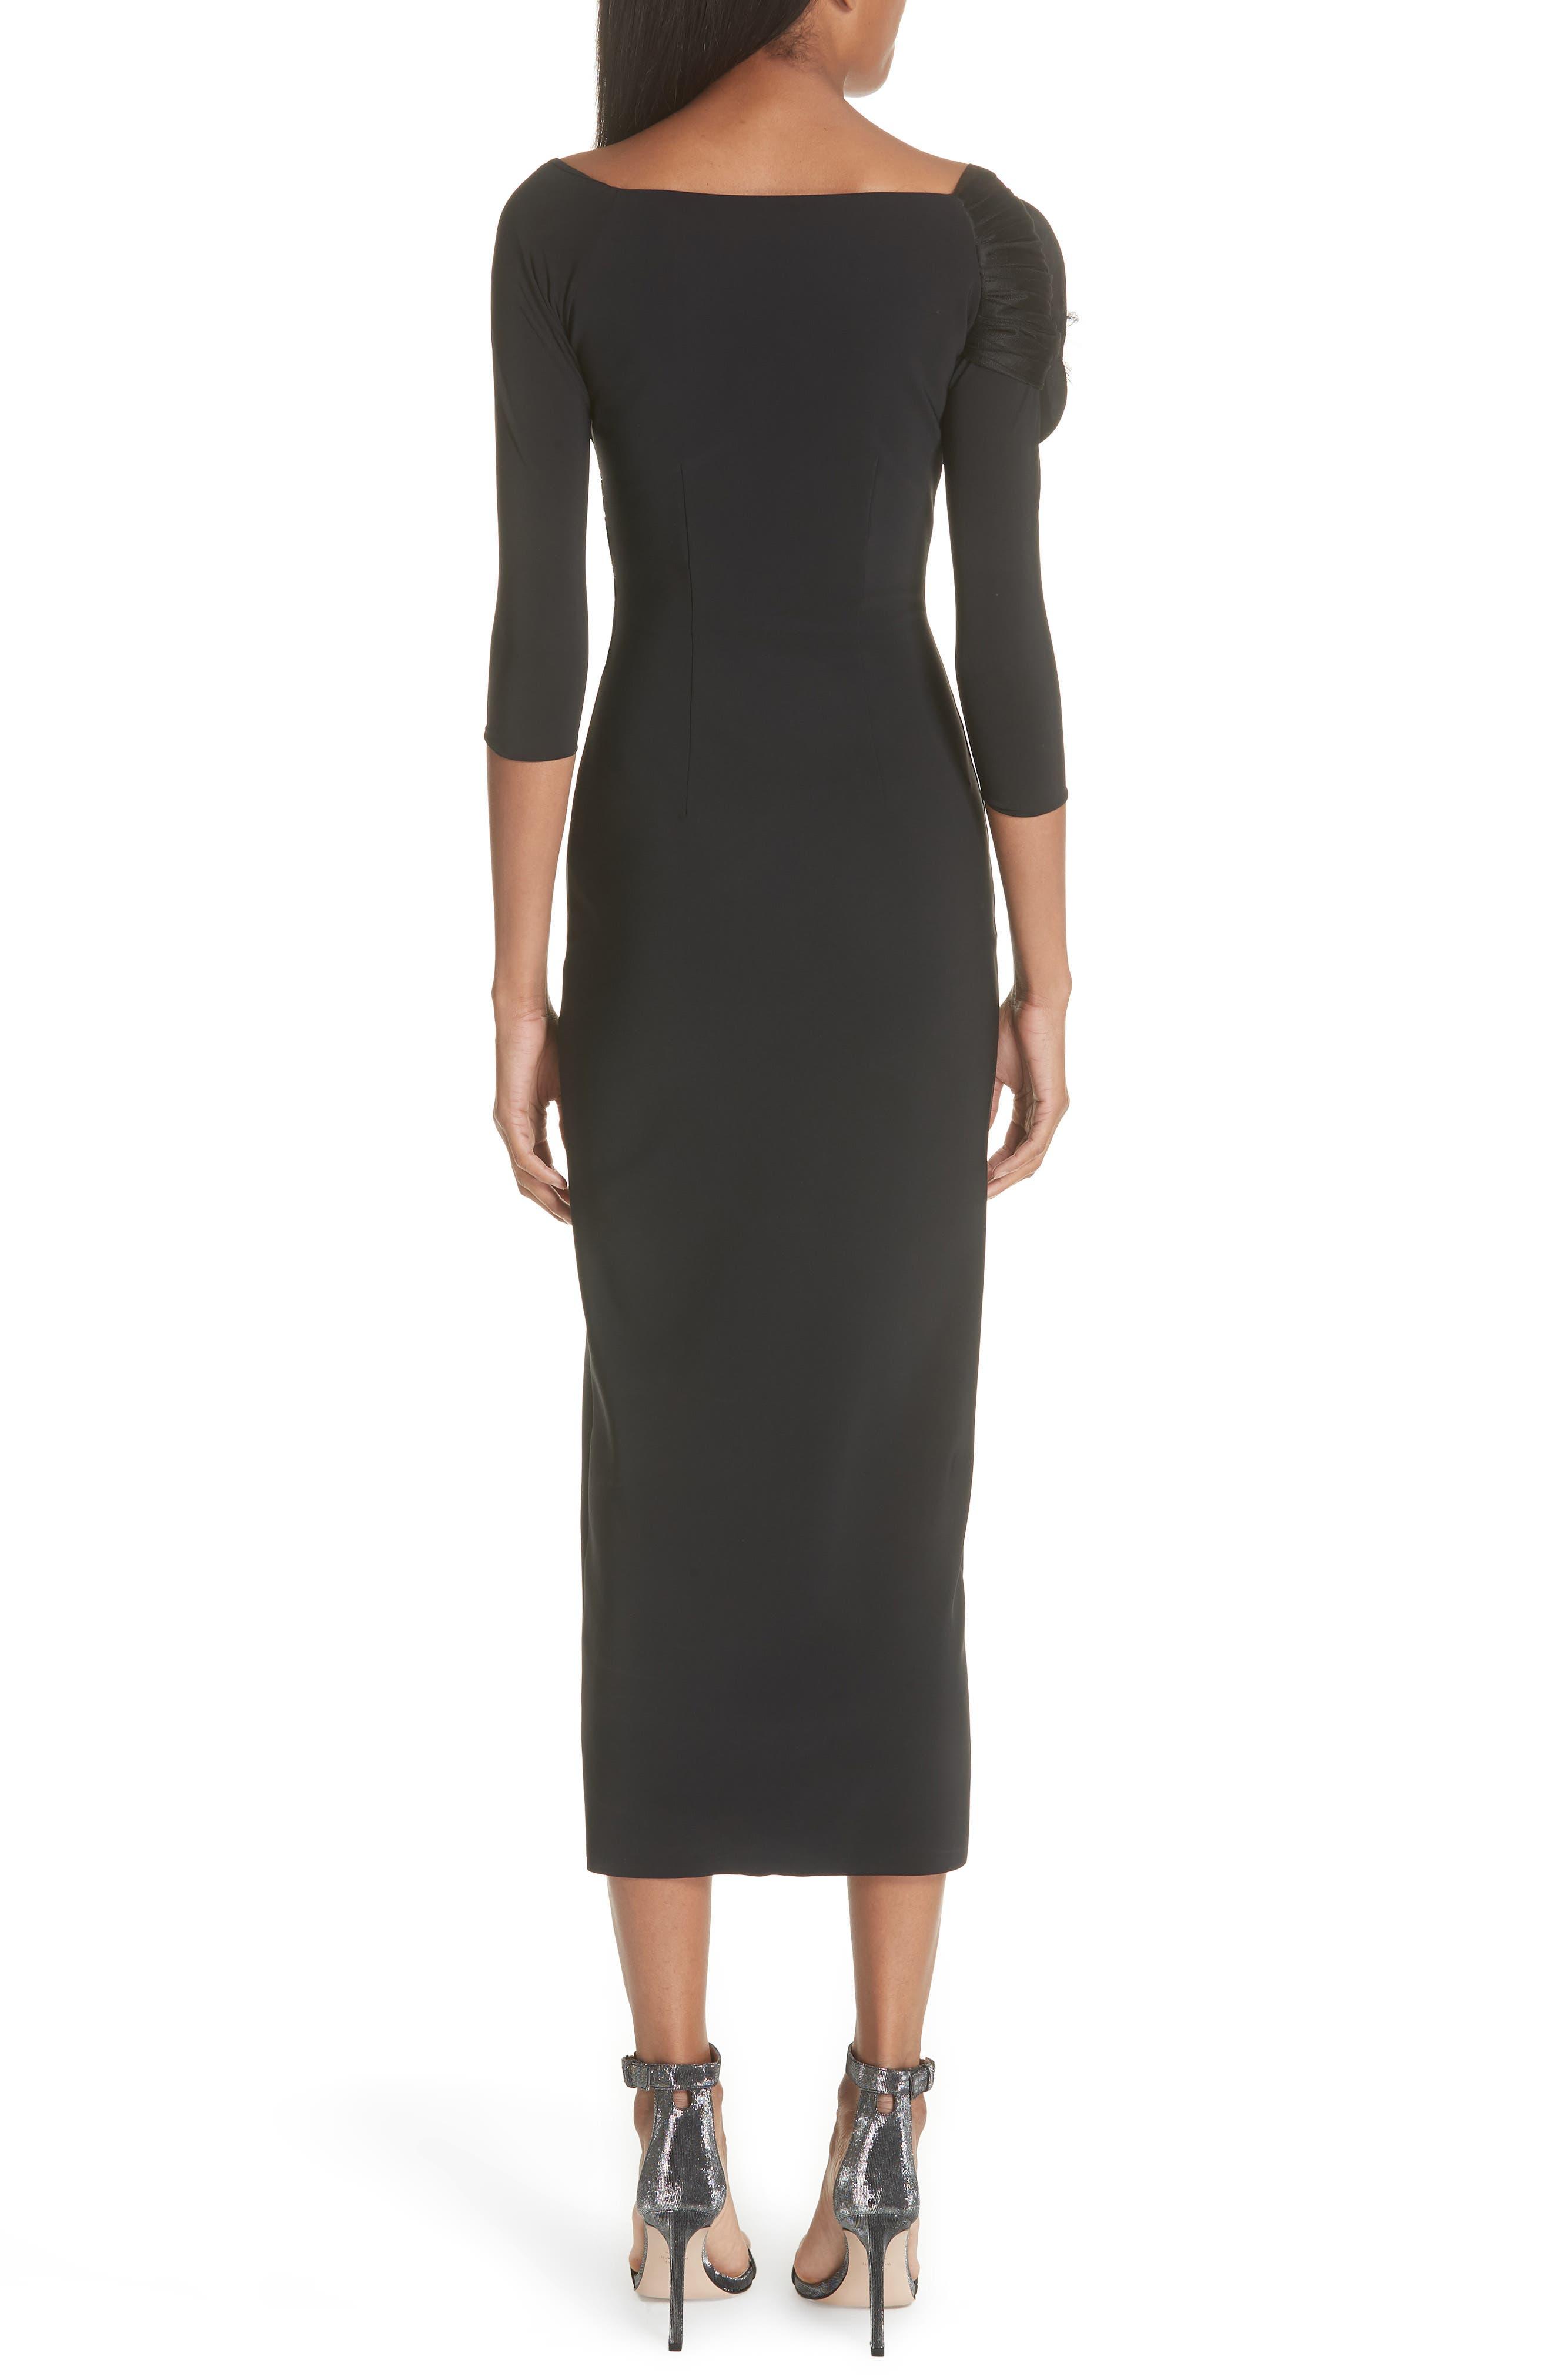 Altyn Taffeta Rose Cocktail Dress,                             Alternate thumbnail 2, color,                             BLACK